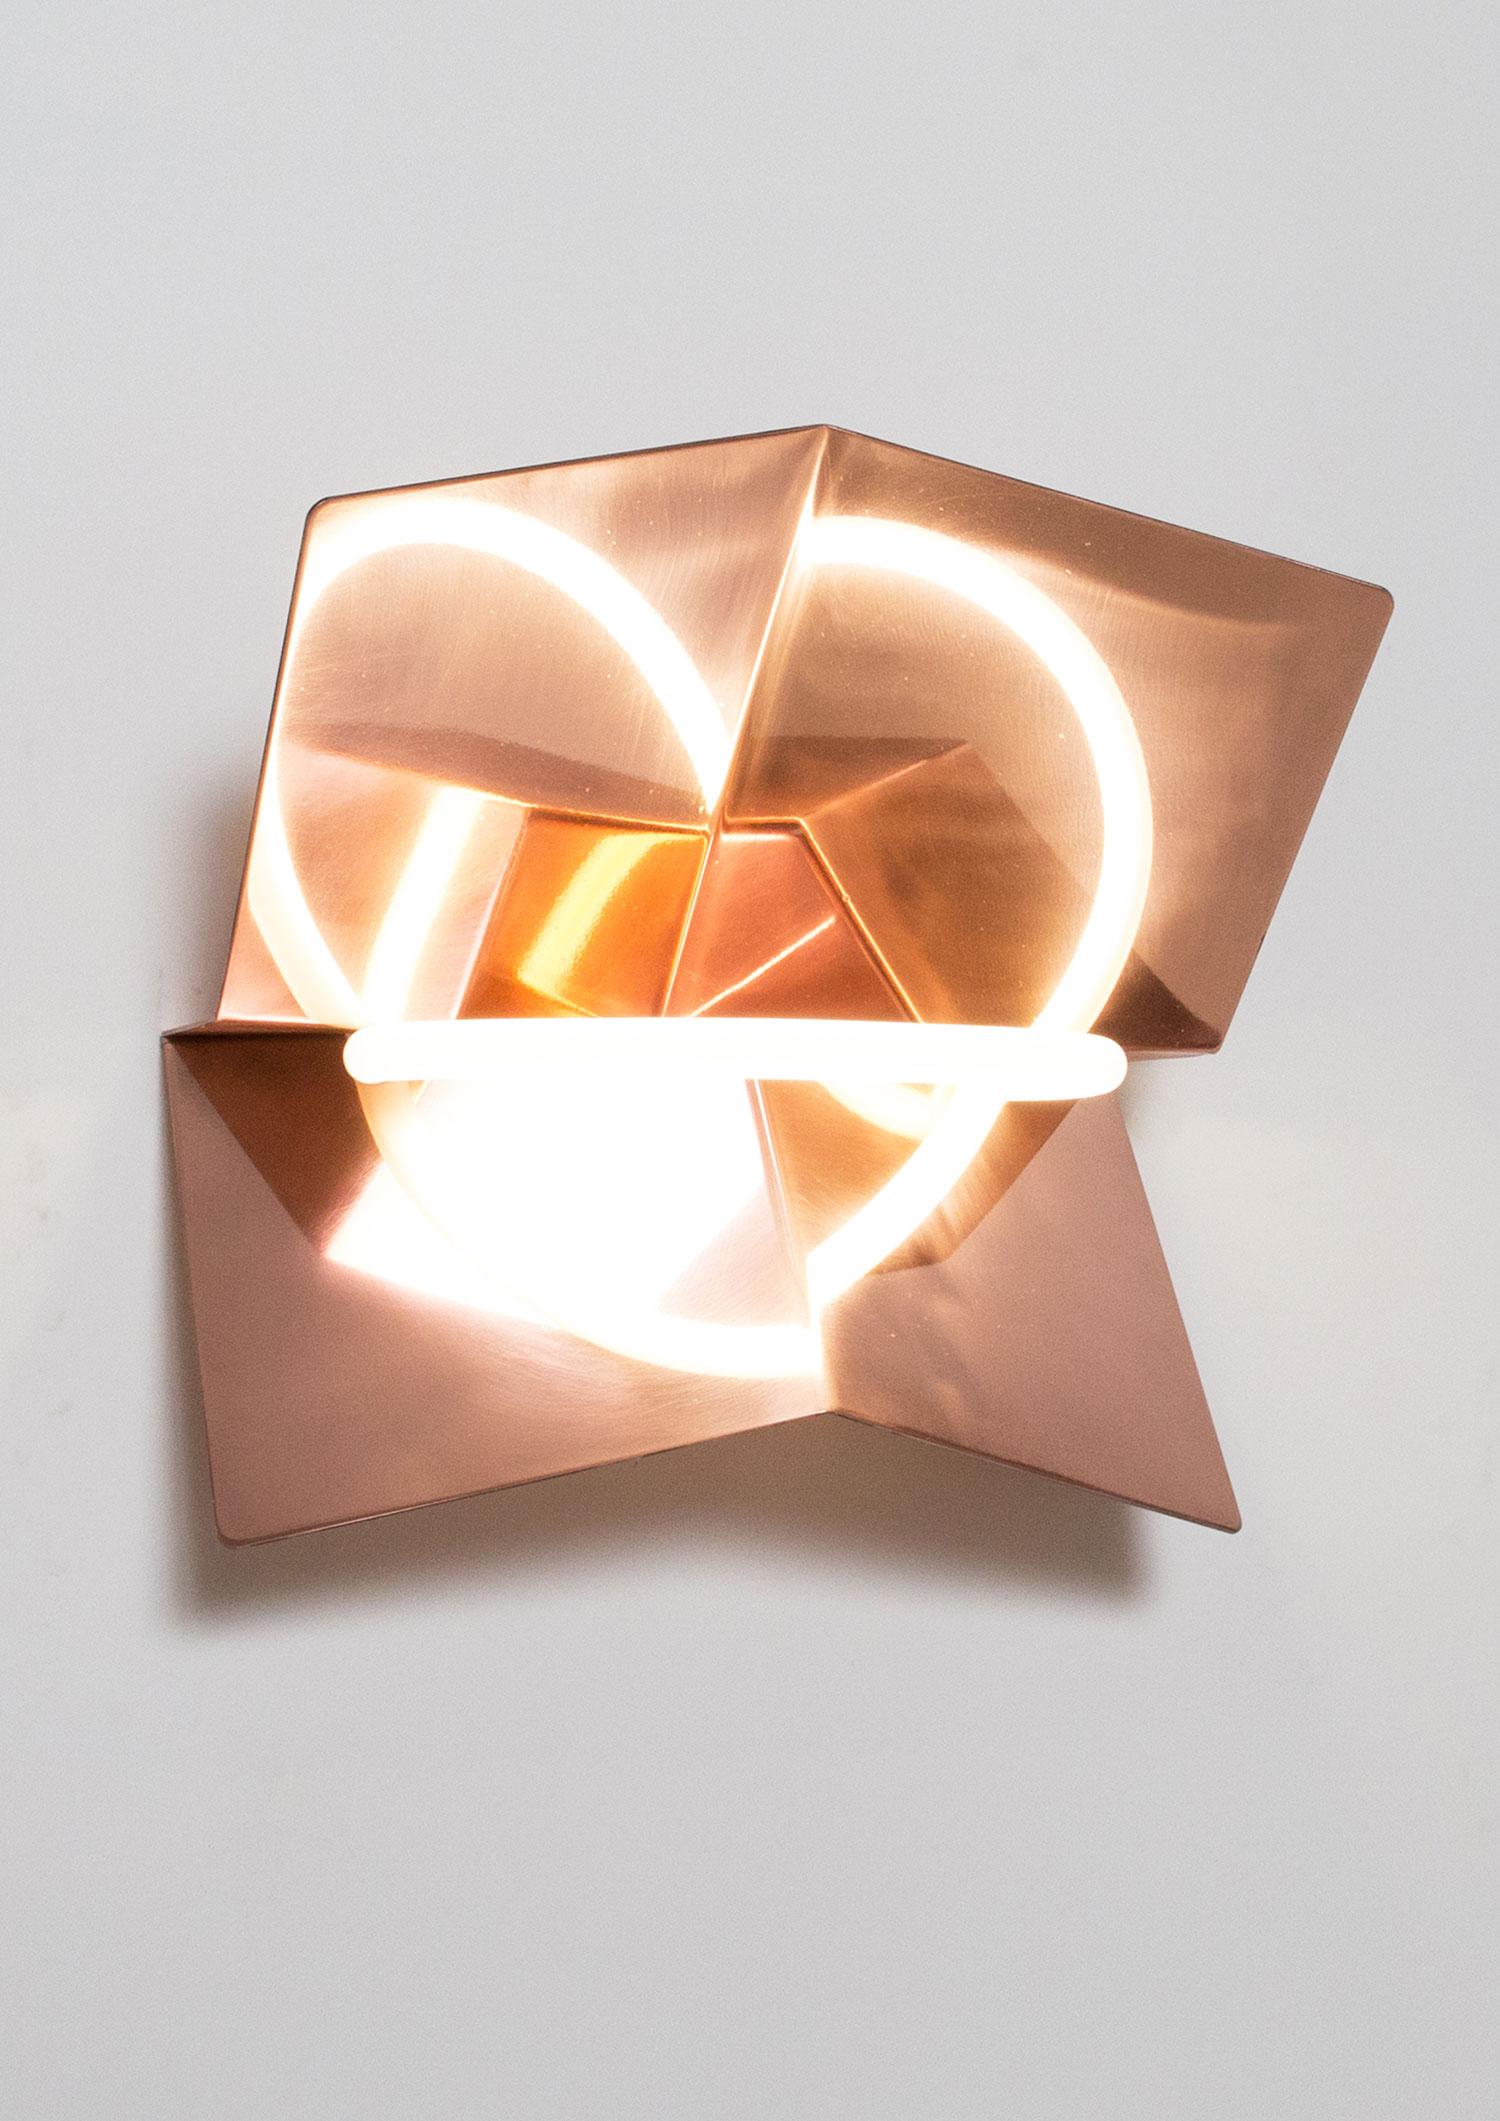 Broken Heart Lamp by Studio Philipp Kafer, Salone Satellite 2016 | #MILANTRACE2016